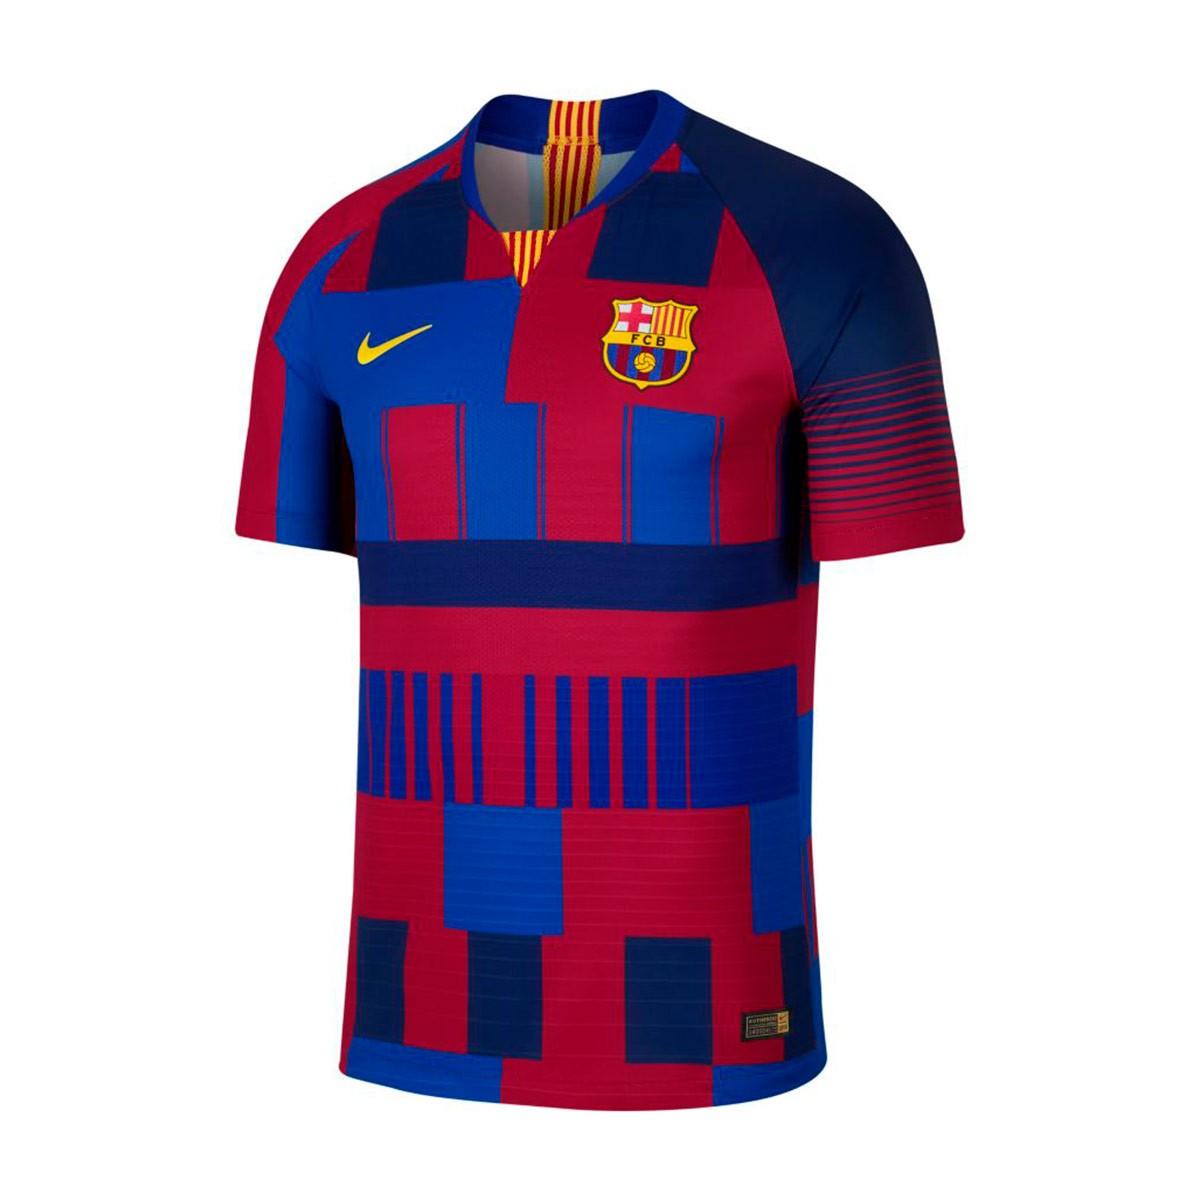 ad3d1f27c Jersey Nike FC Barcelona Vapor Match 20 years Deep royal blue-Noble red-Tour  yellow - Tienda de fútbol Fútbol Emotion